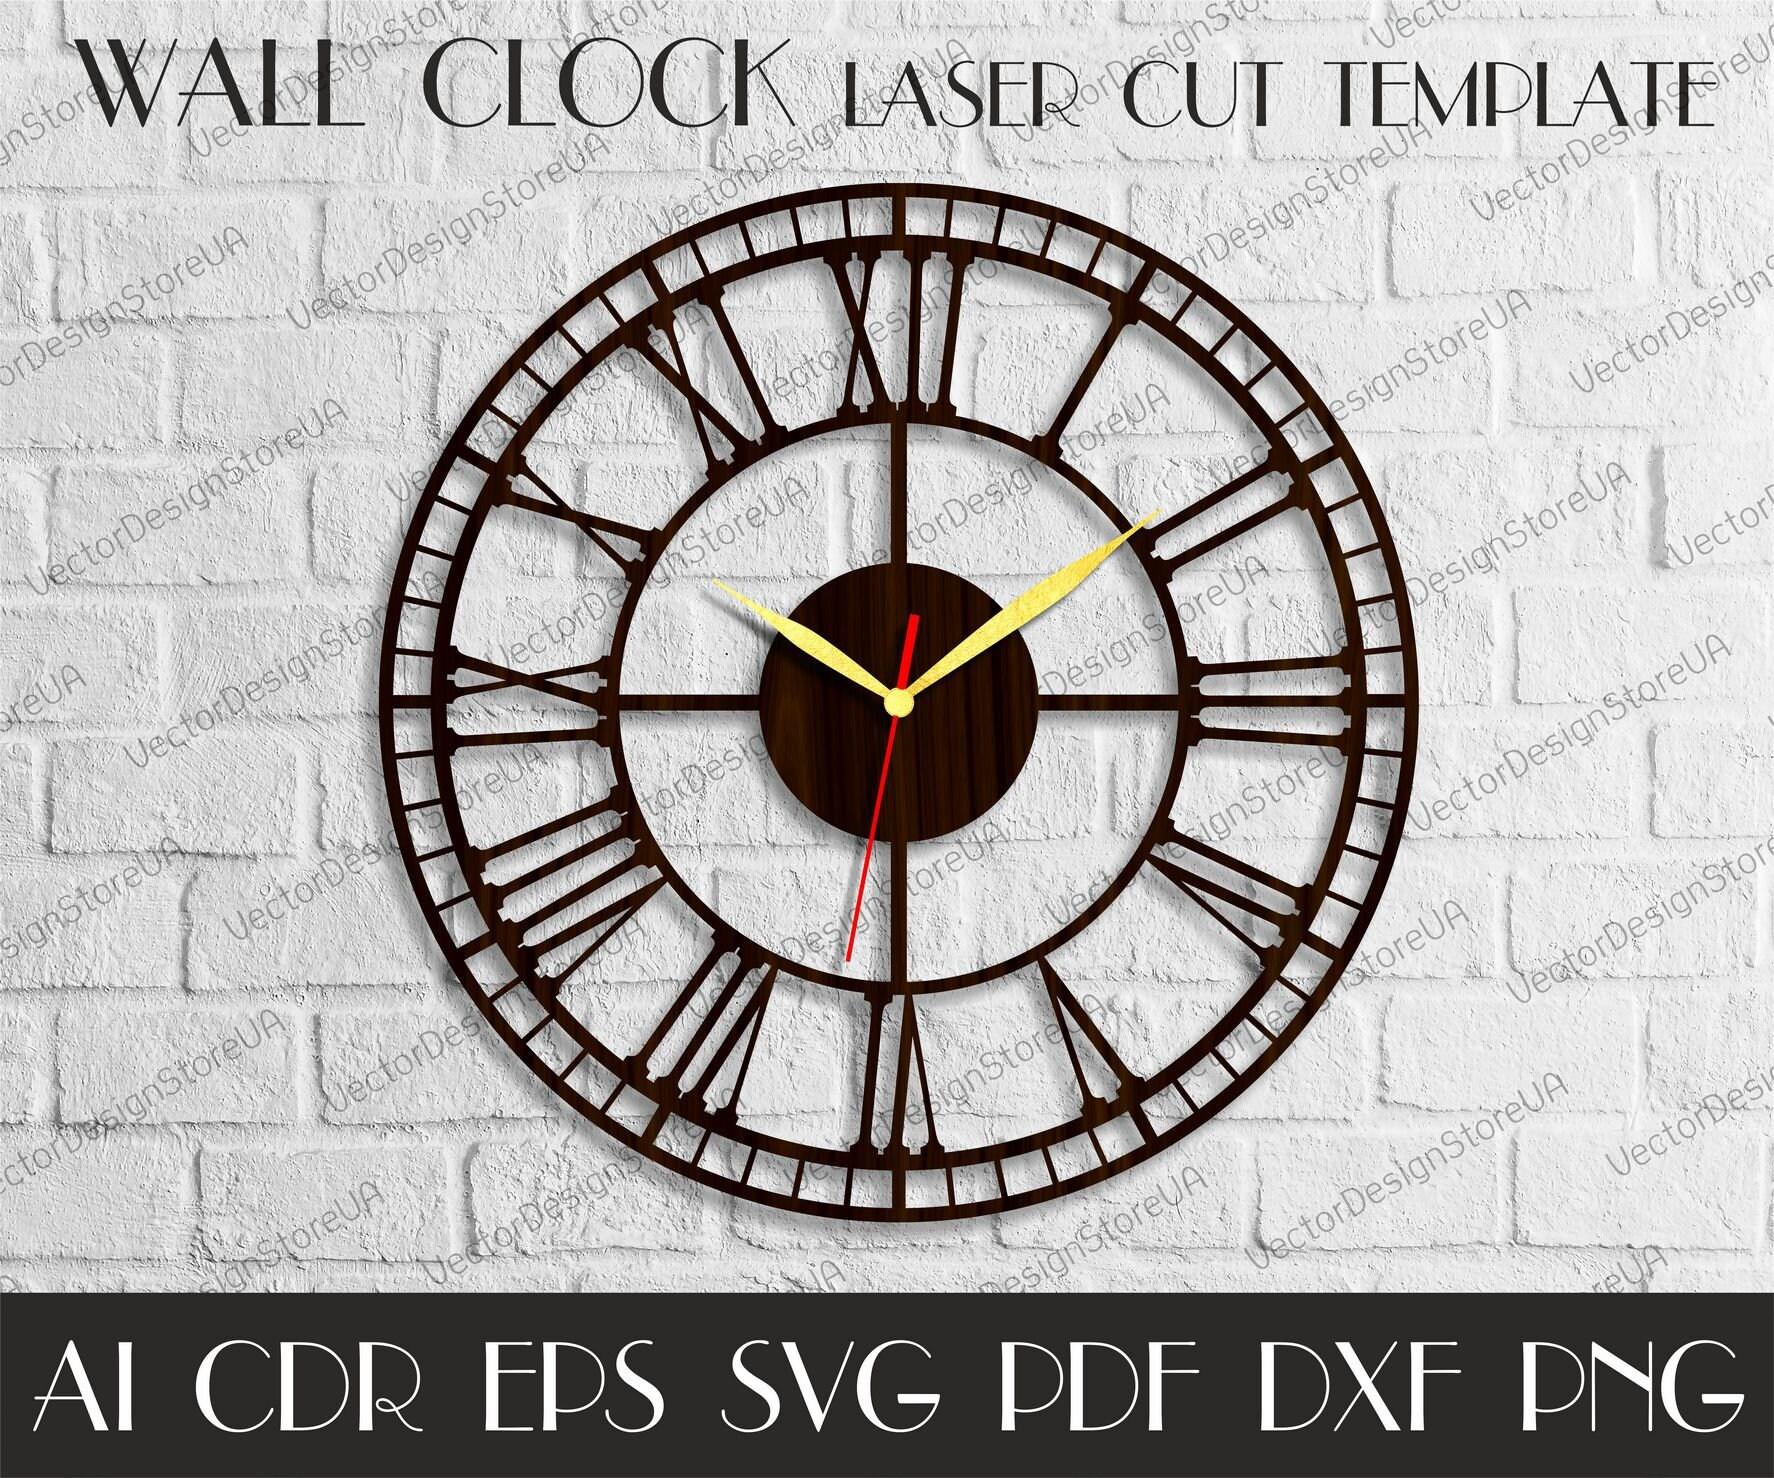 Vintage clock Large wall clock Wood wall clock Laser cut   Etsy